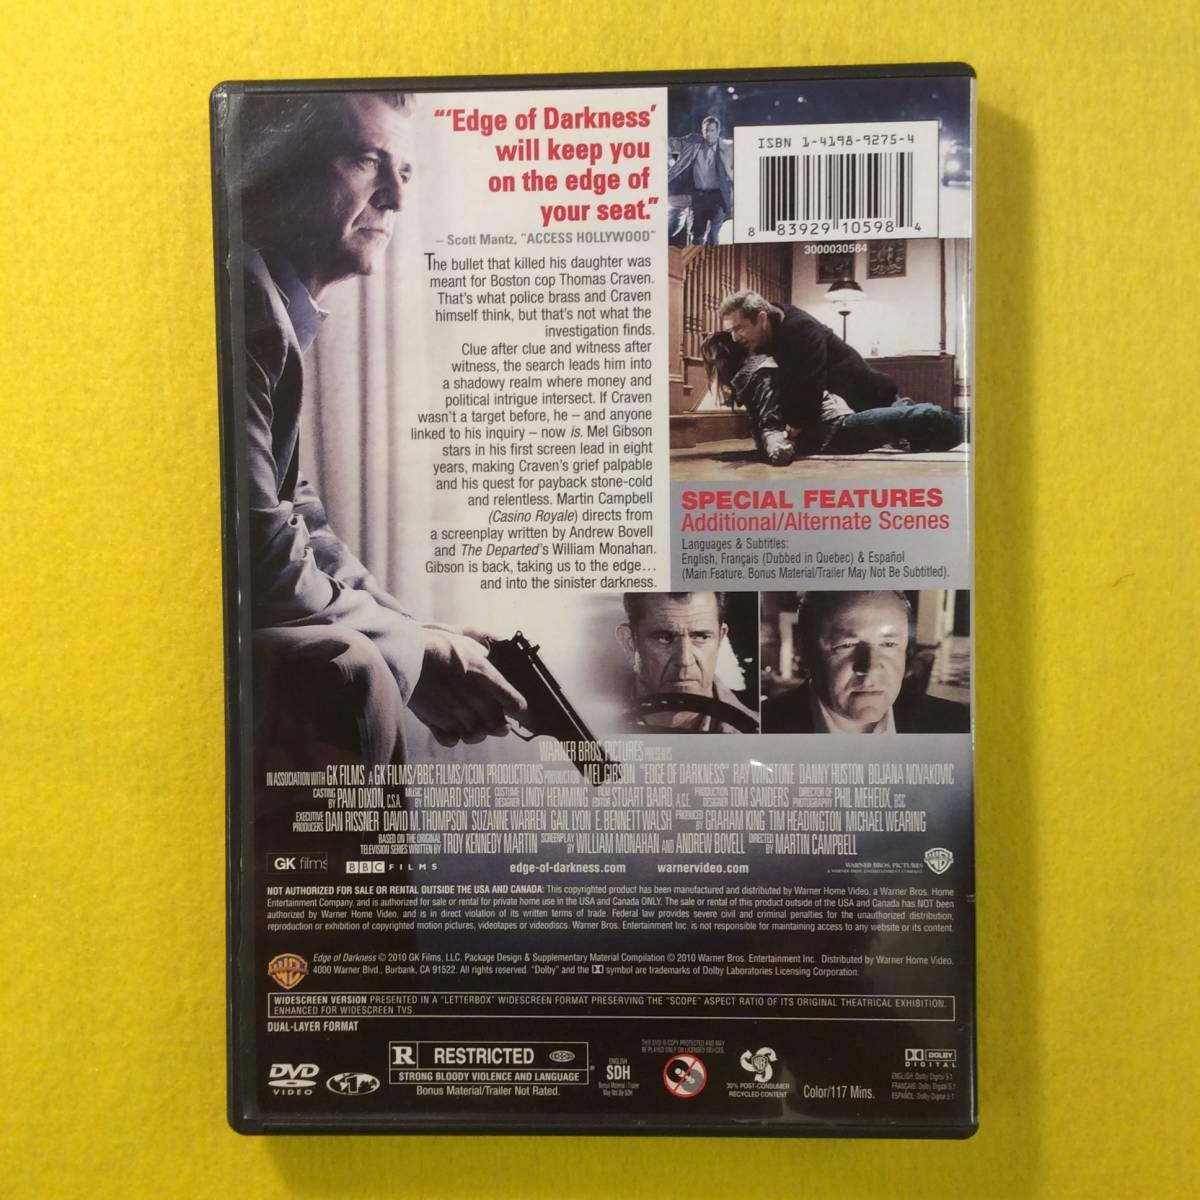 【DVD】復讐捜査線・EDGE of DARKNESS★輸入盤 リージョン1★Mel Gibson・メル ギブソン★映画_画像2